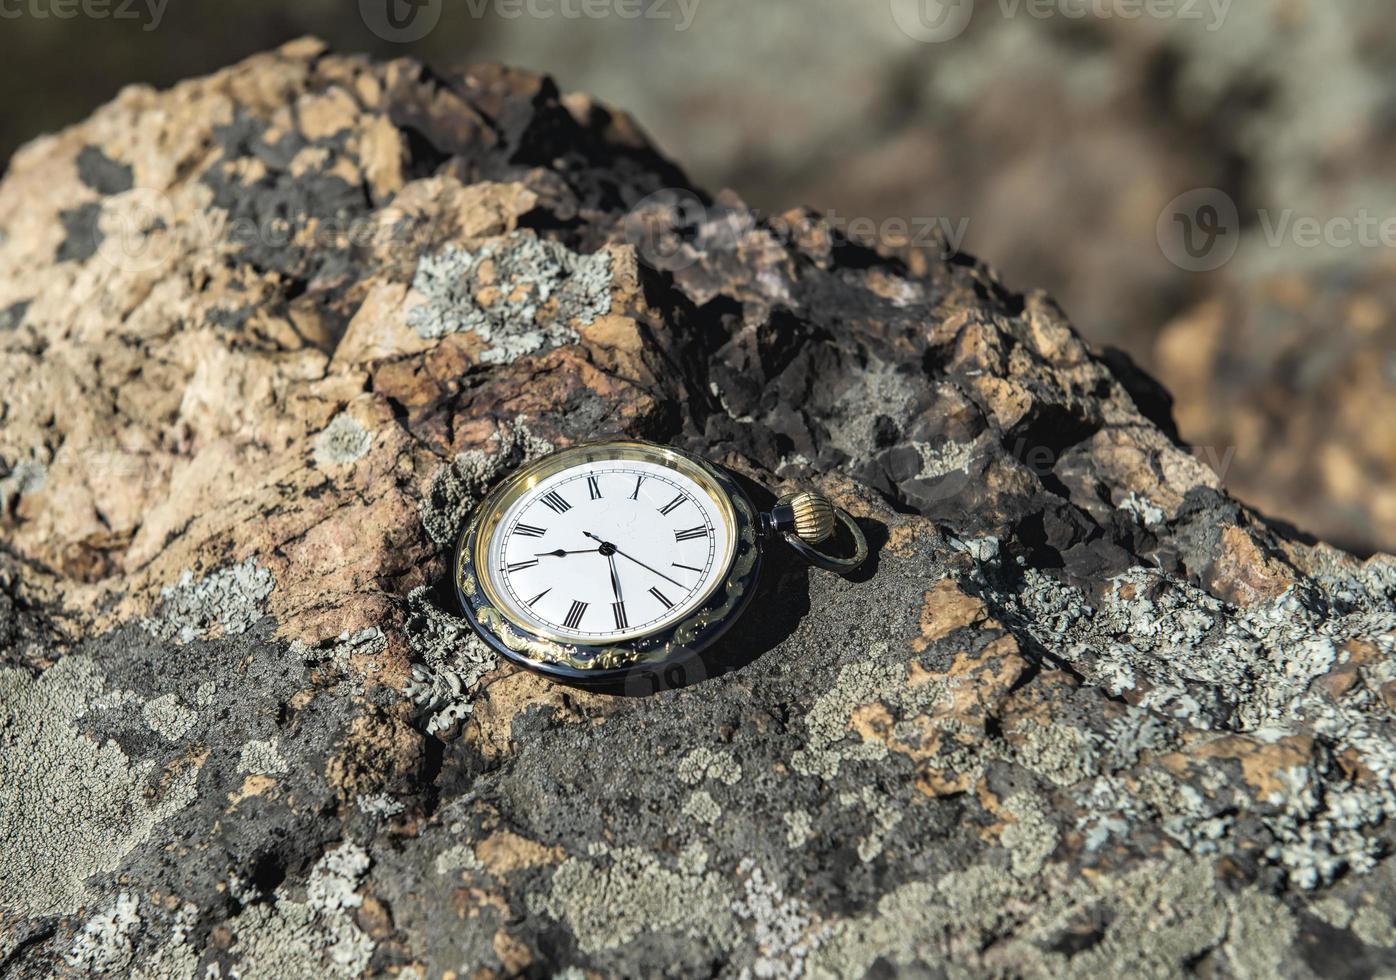 Watch on rocks photo